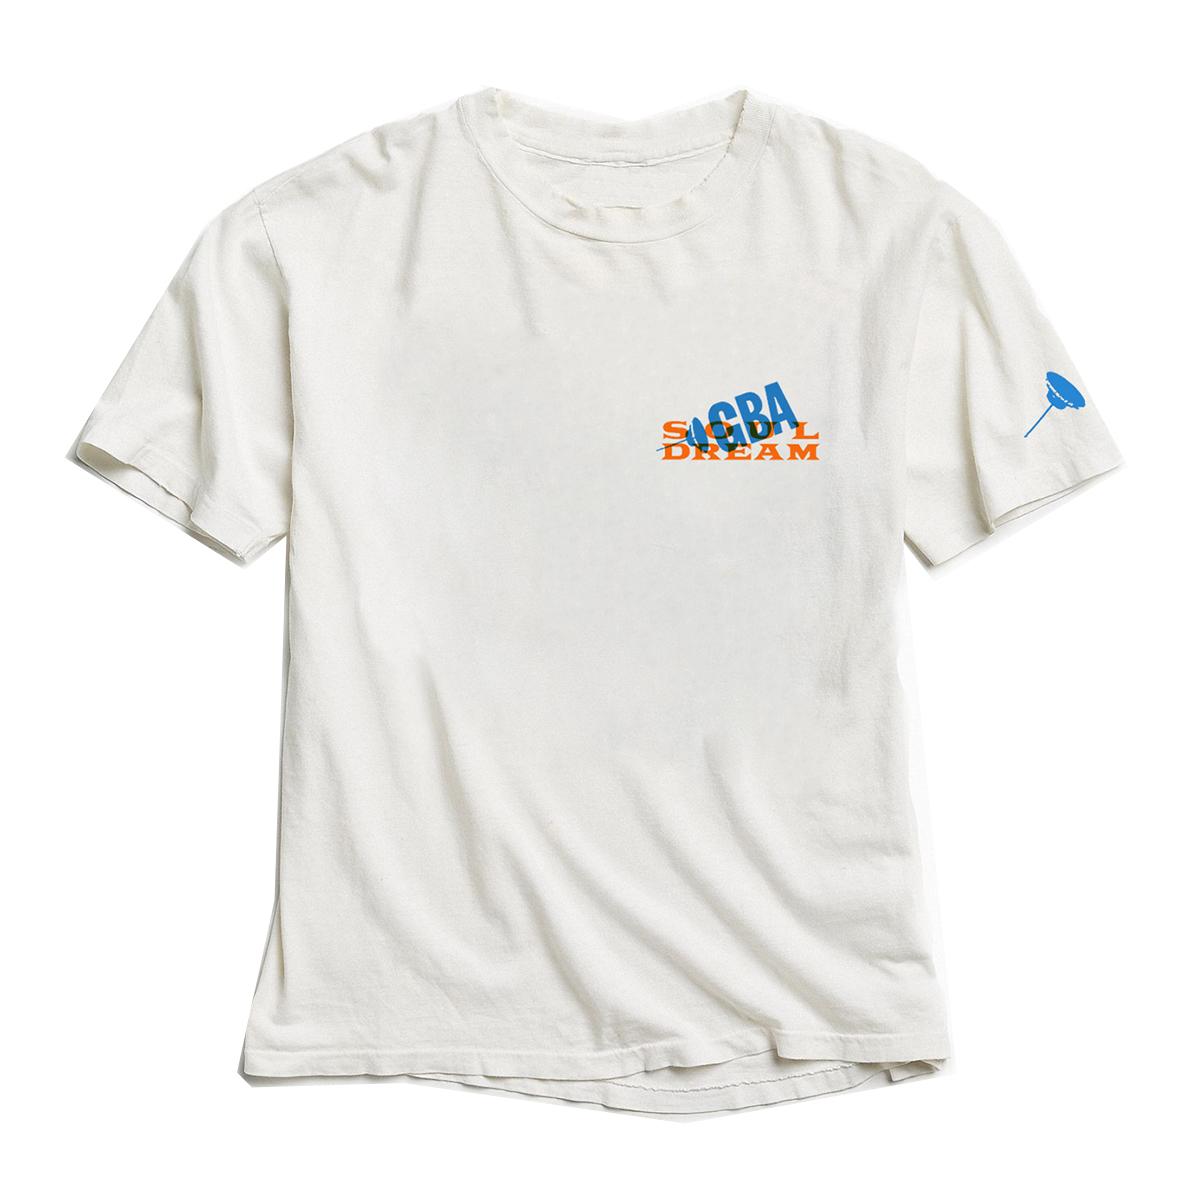 Soul Dream T-Shirt & Nalgene Bundle